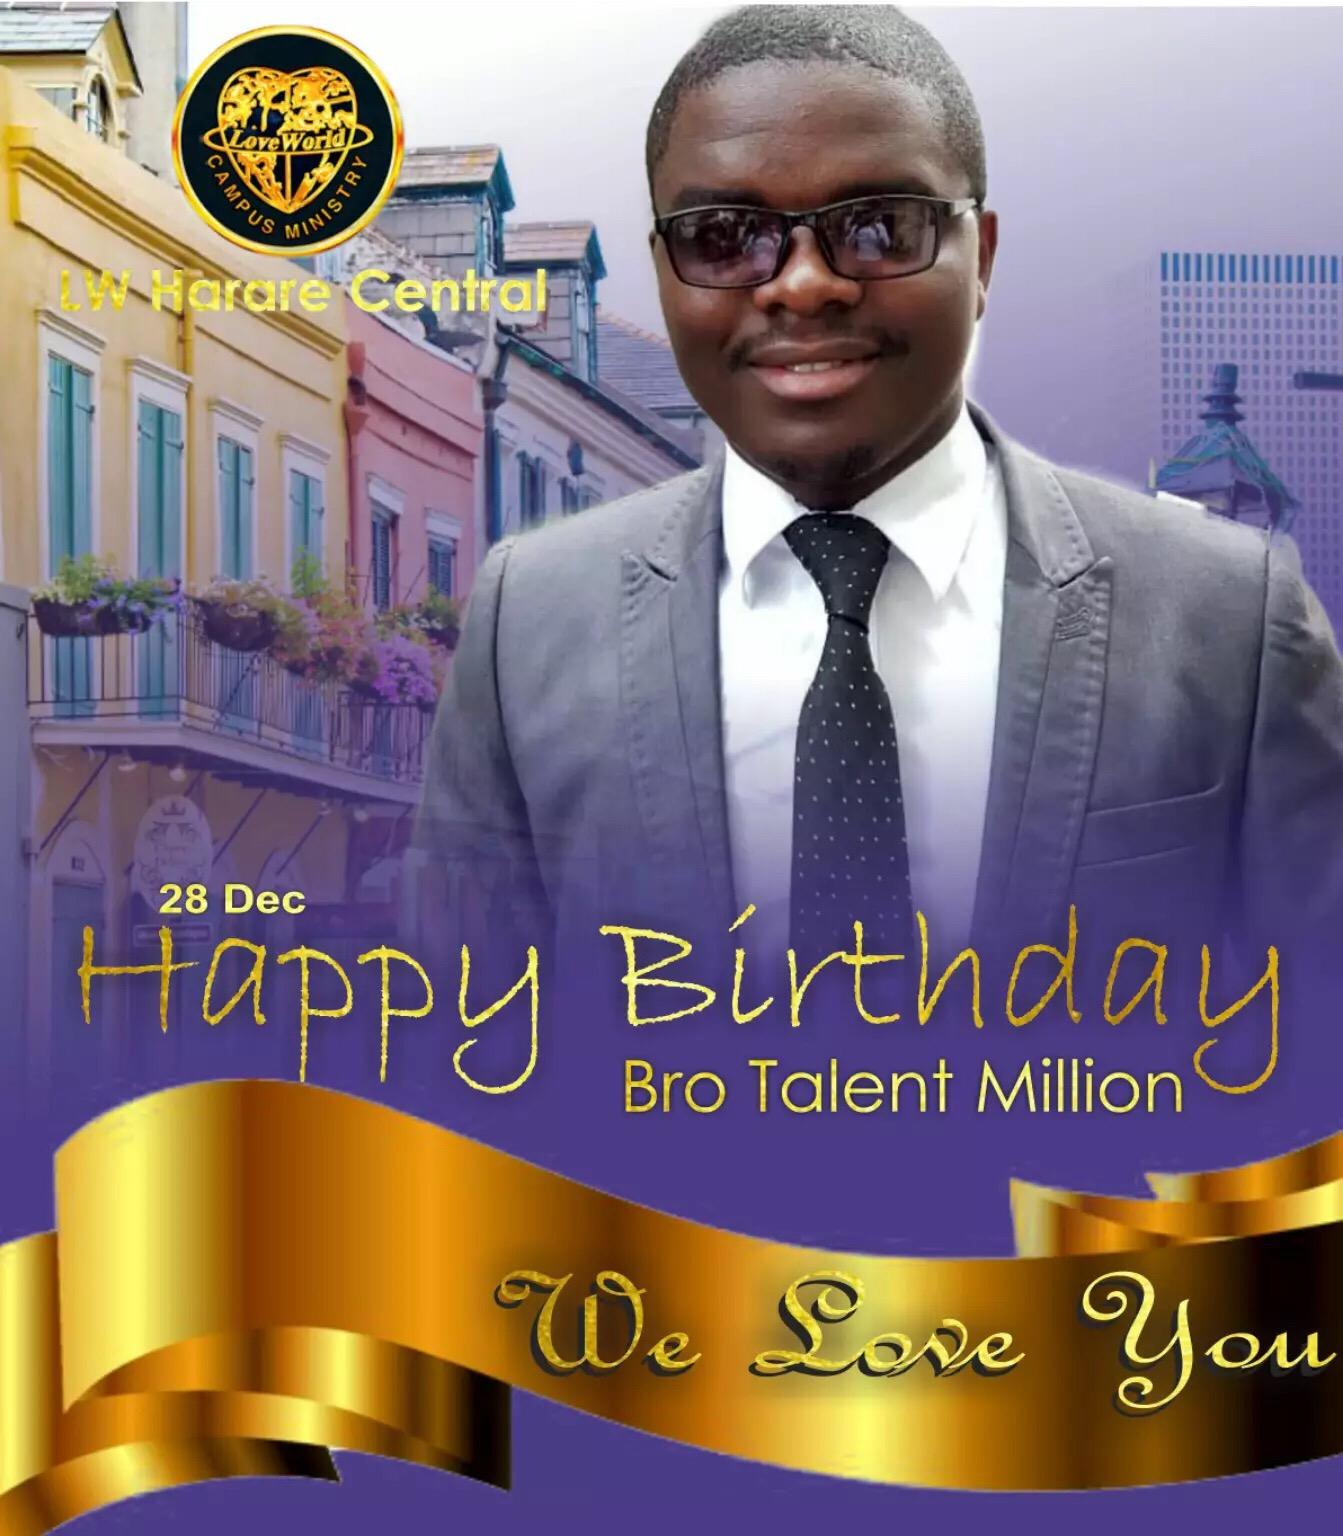 Mr Million- Happiest Birthday to